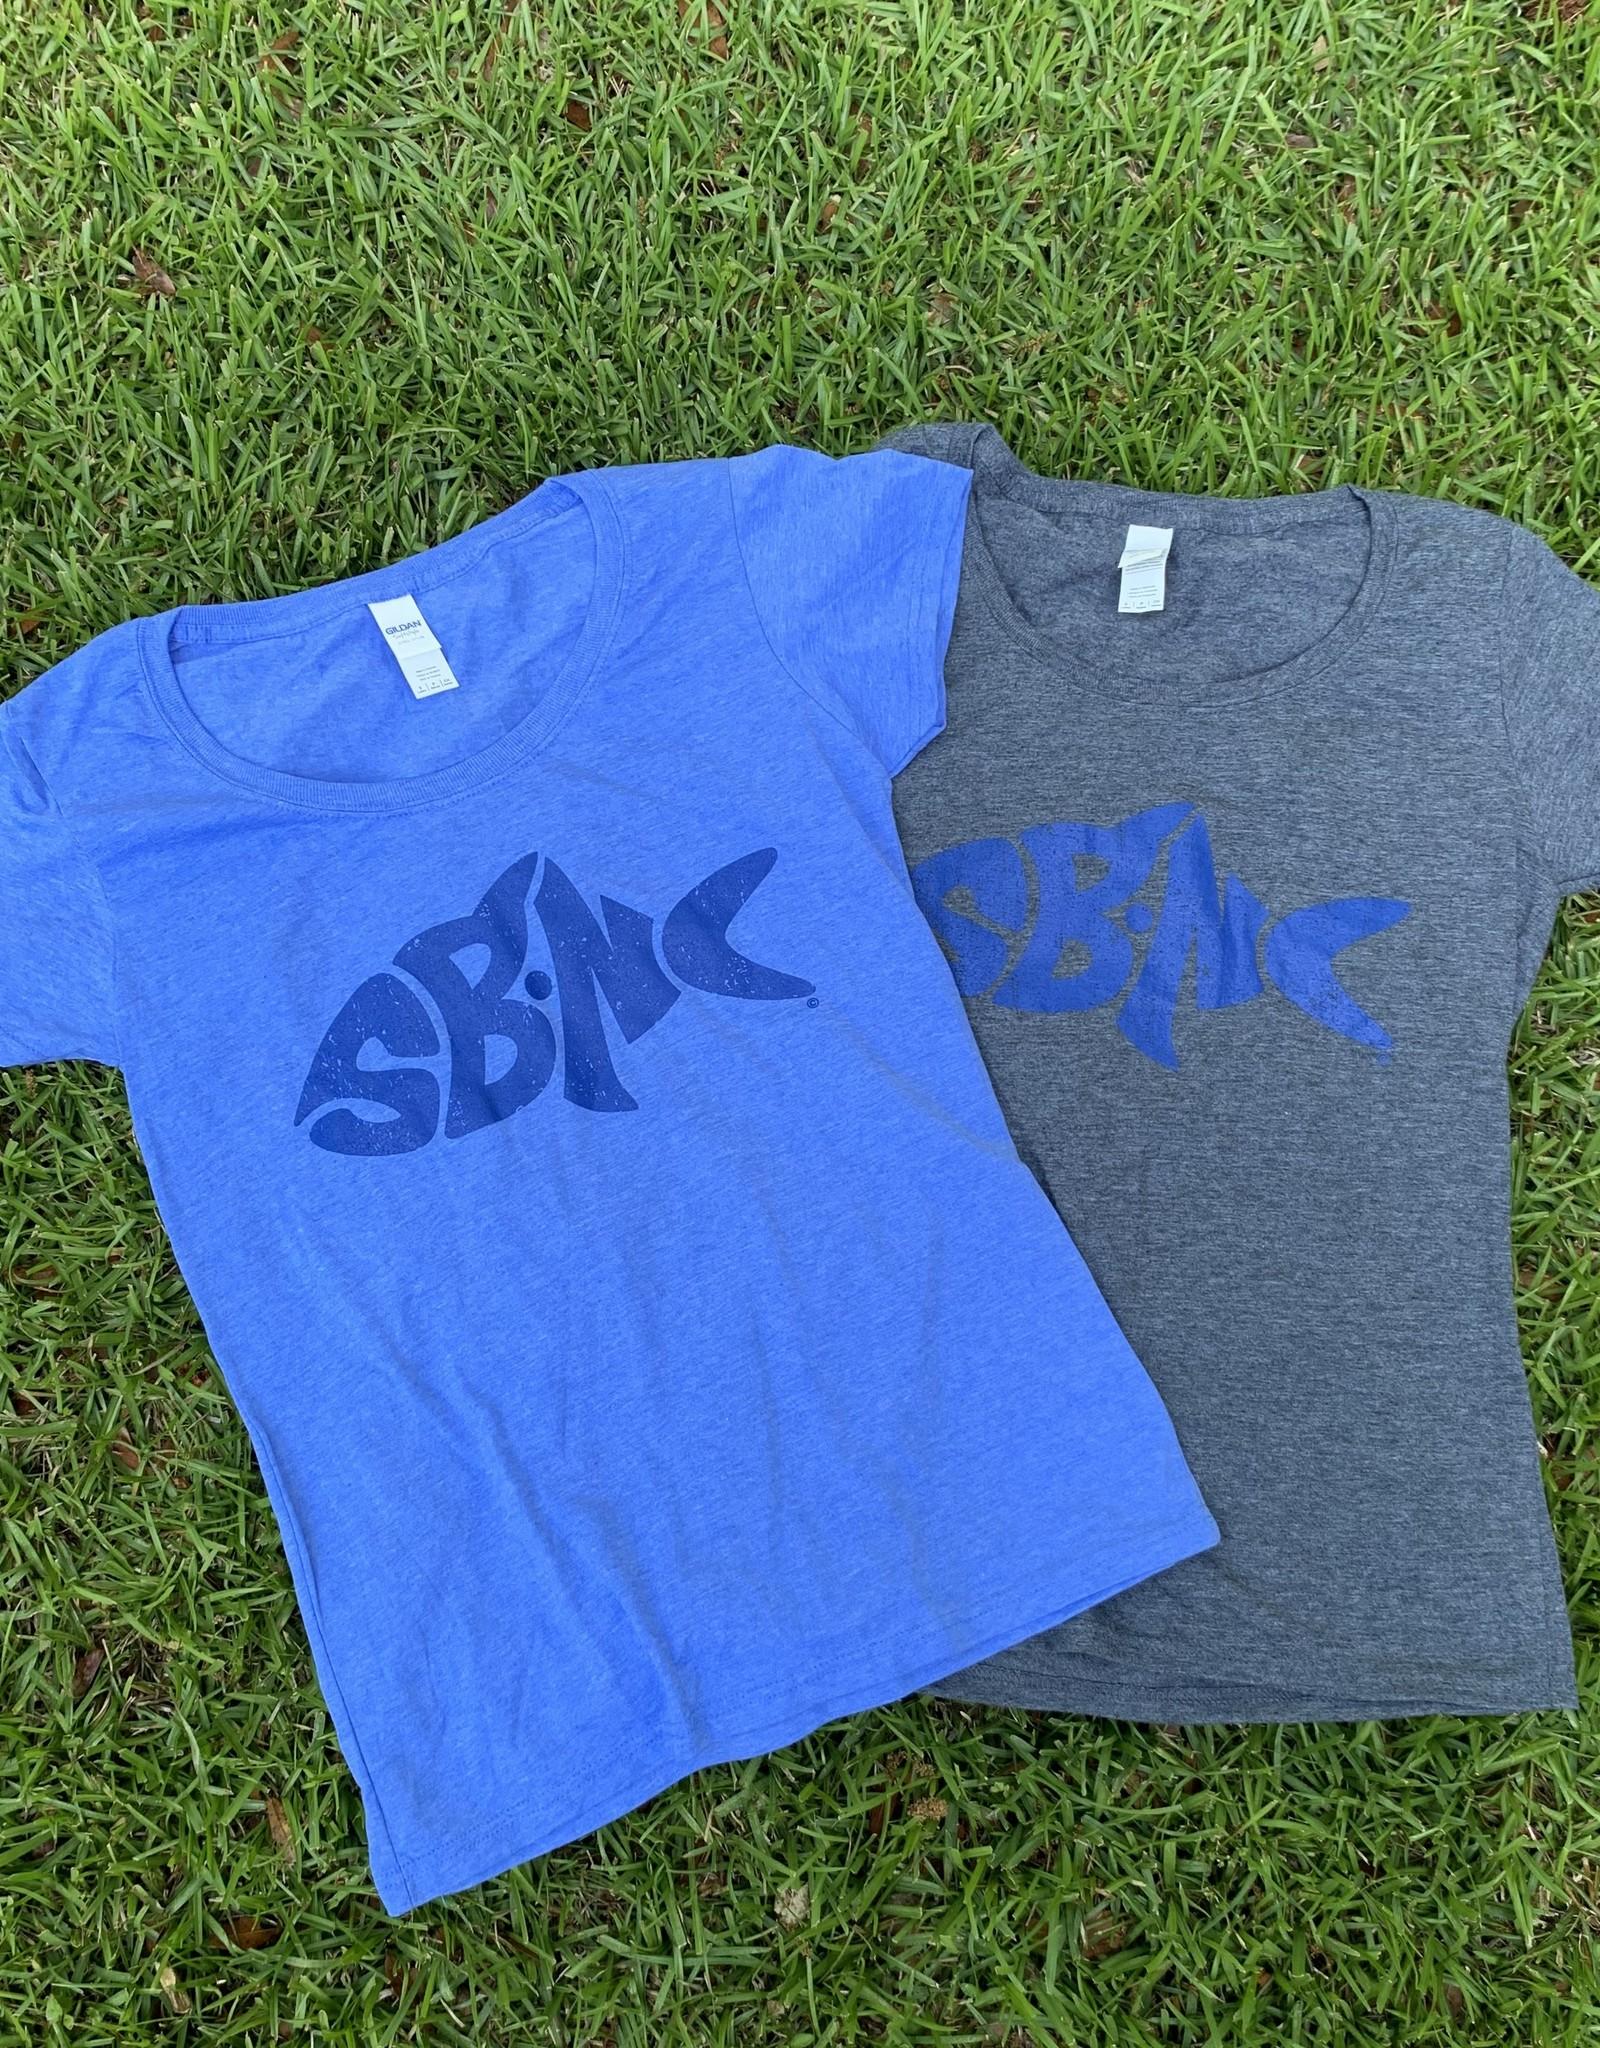 sbncfish SBNC FISH BLUE INK LADIES SS TEE